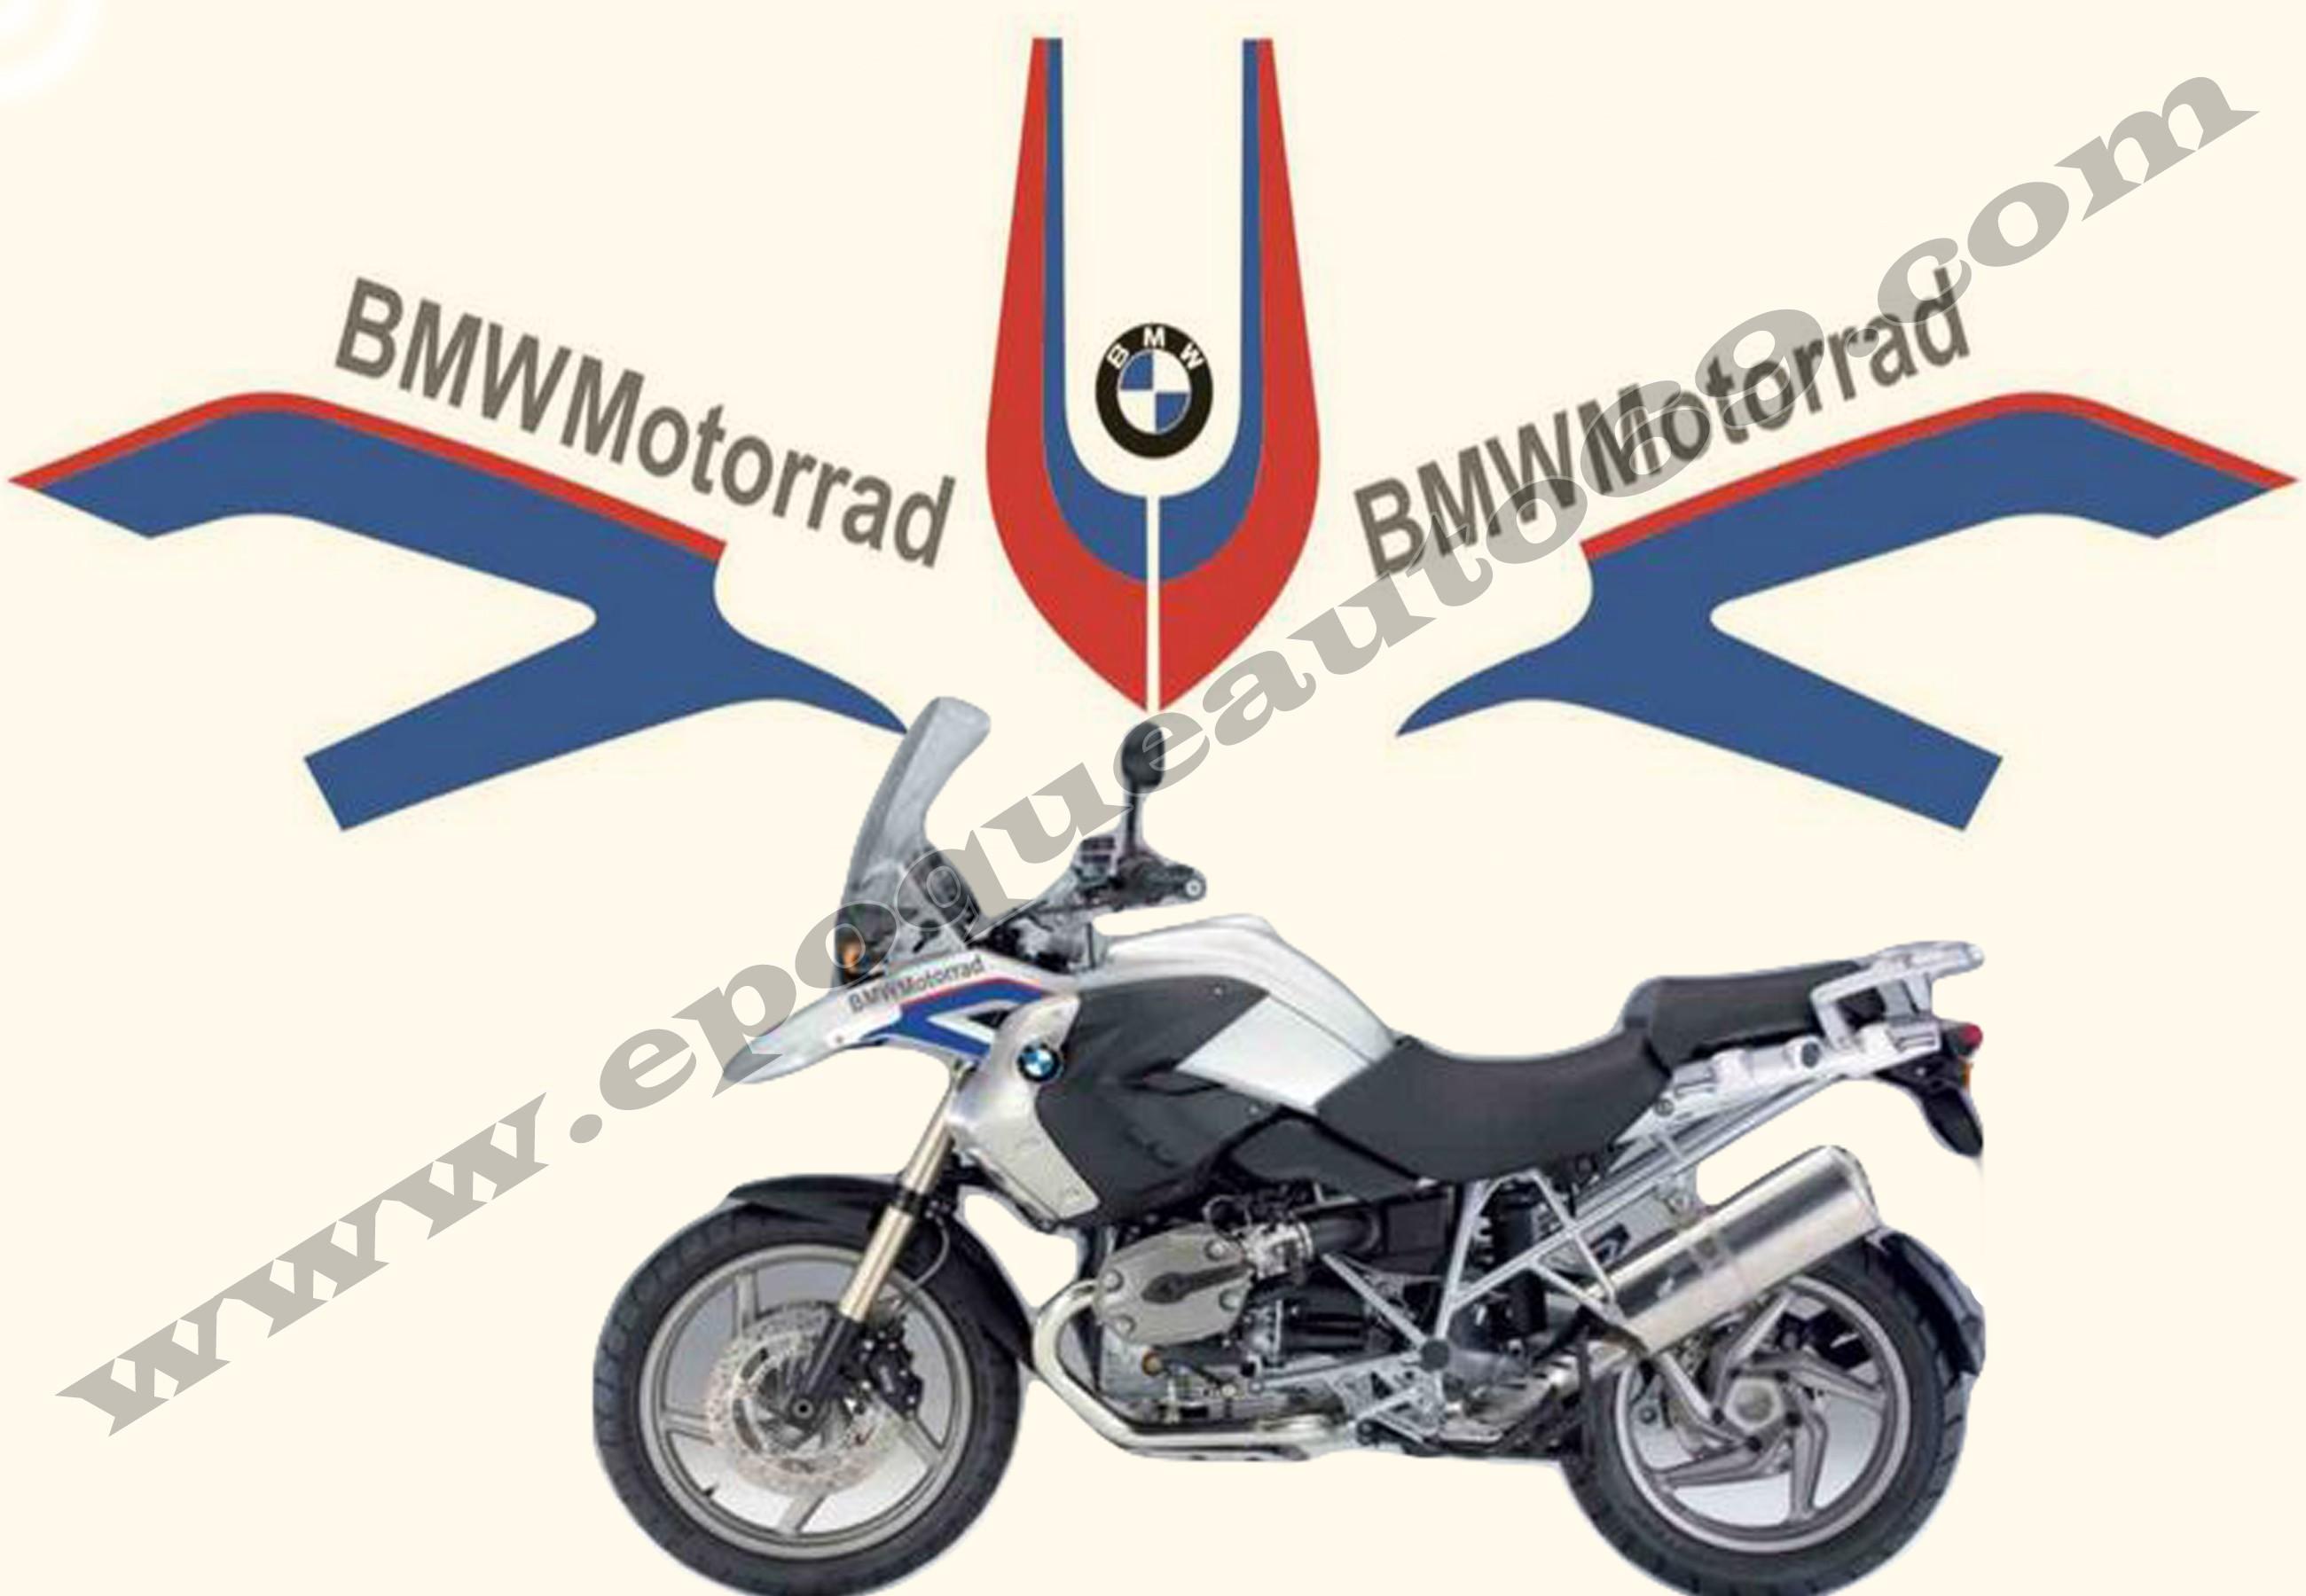 autocollant moto bmw id es d 39 image de moto. Black Bedroom Furniture Sets. Home Design Ideas